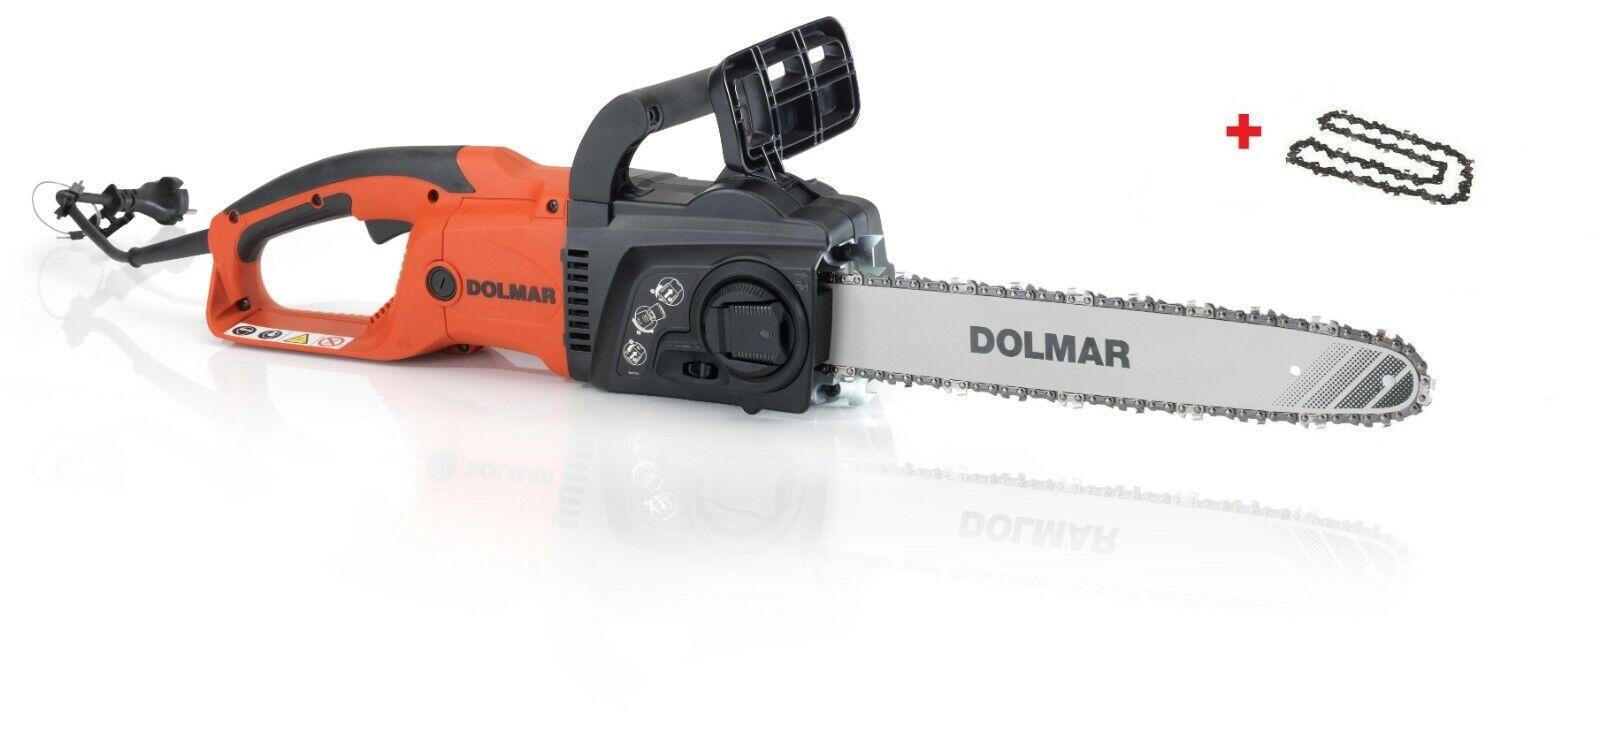 DOLMAR Elektro Kettensäge ES164TLC X-35 inkl. 2. Kette 1900W, ES164 NEU und OVP